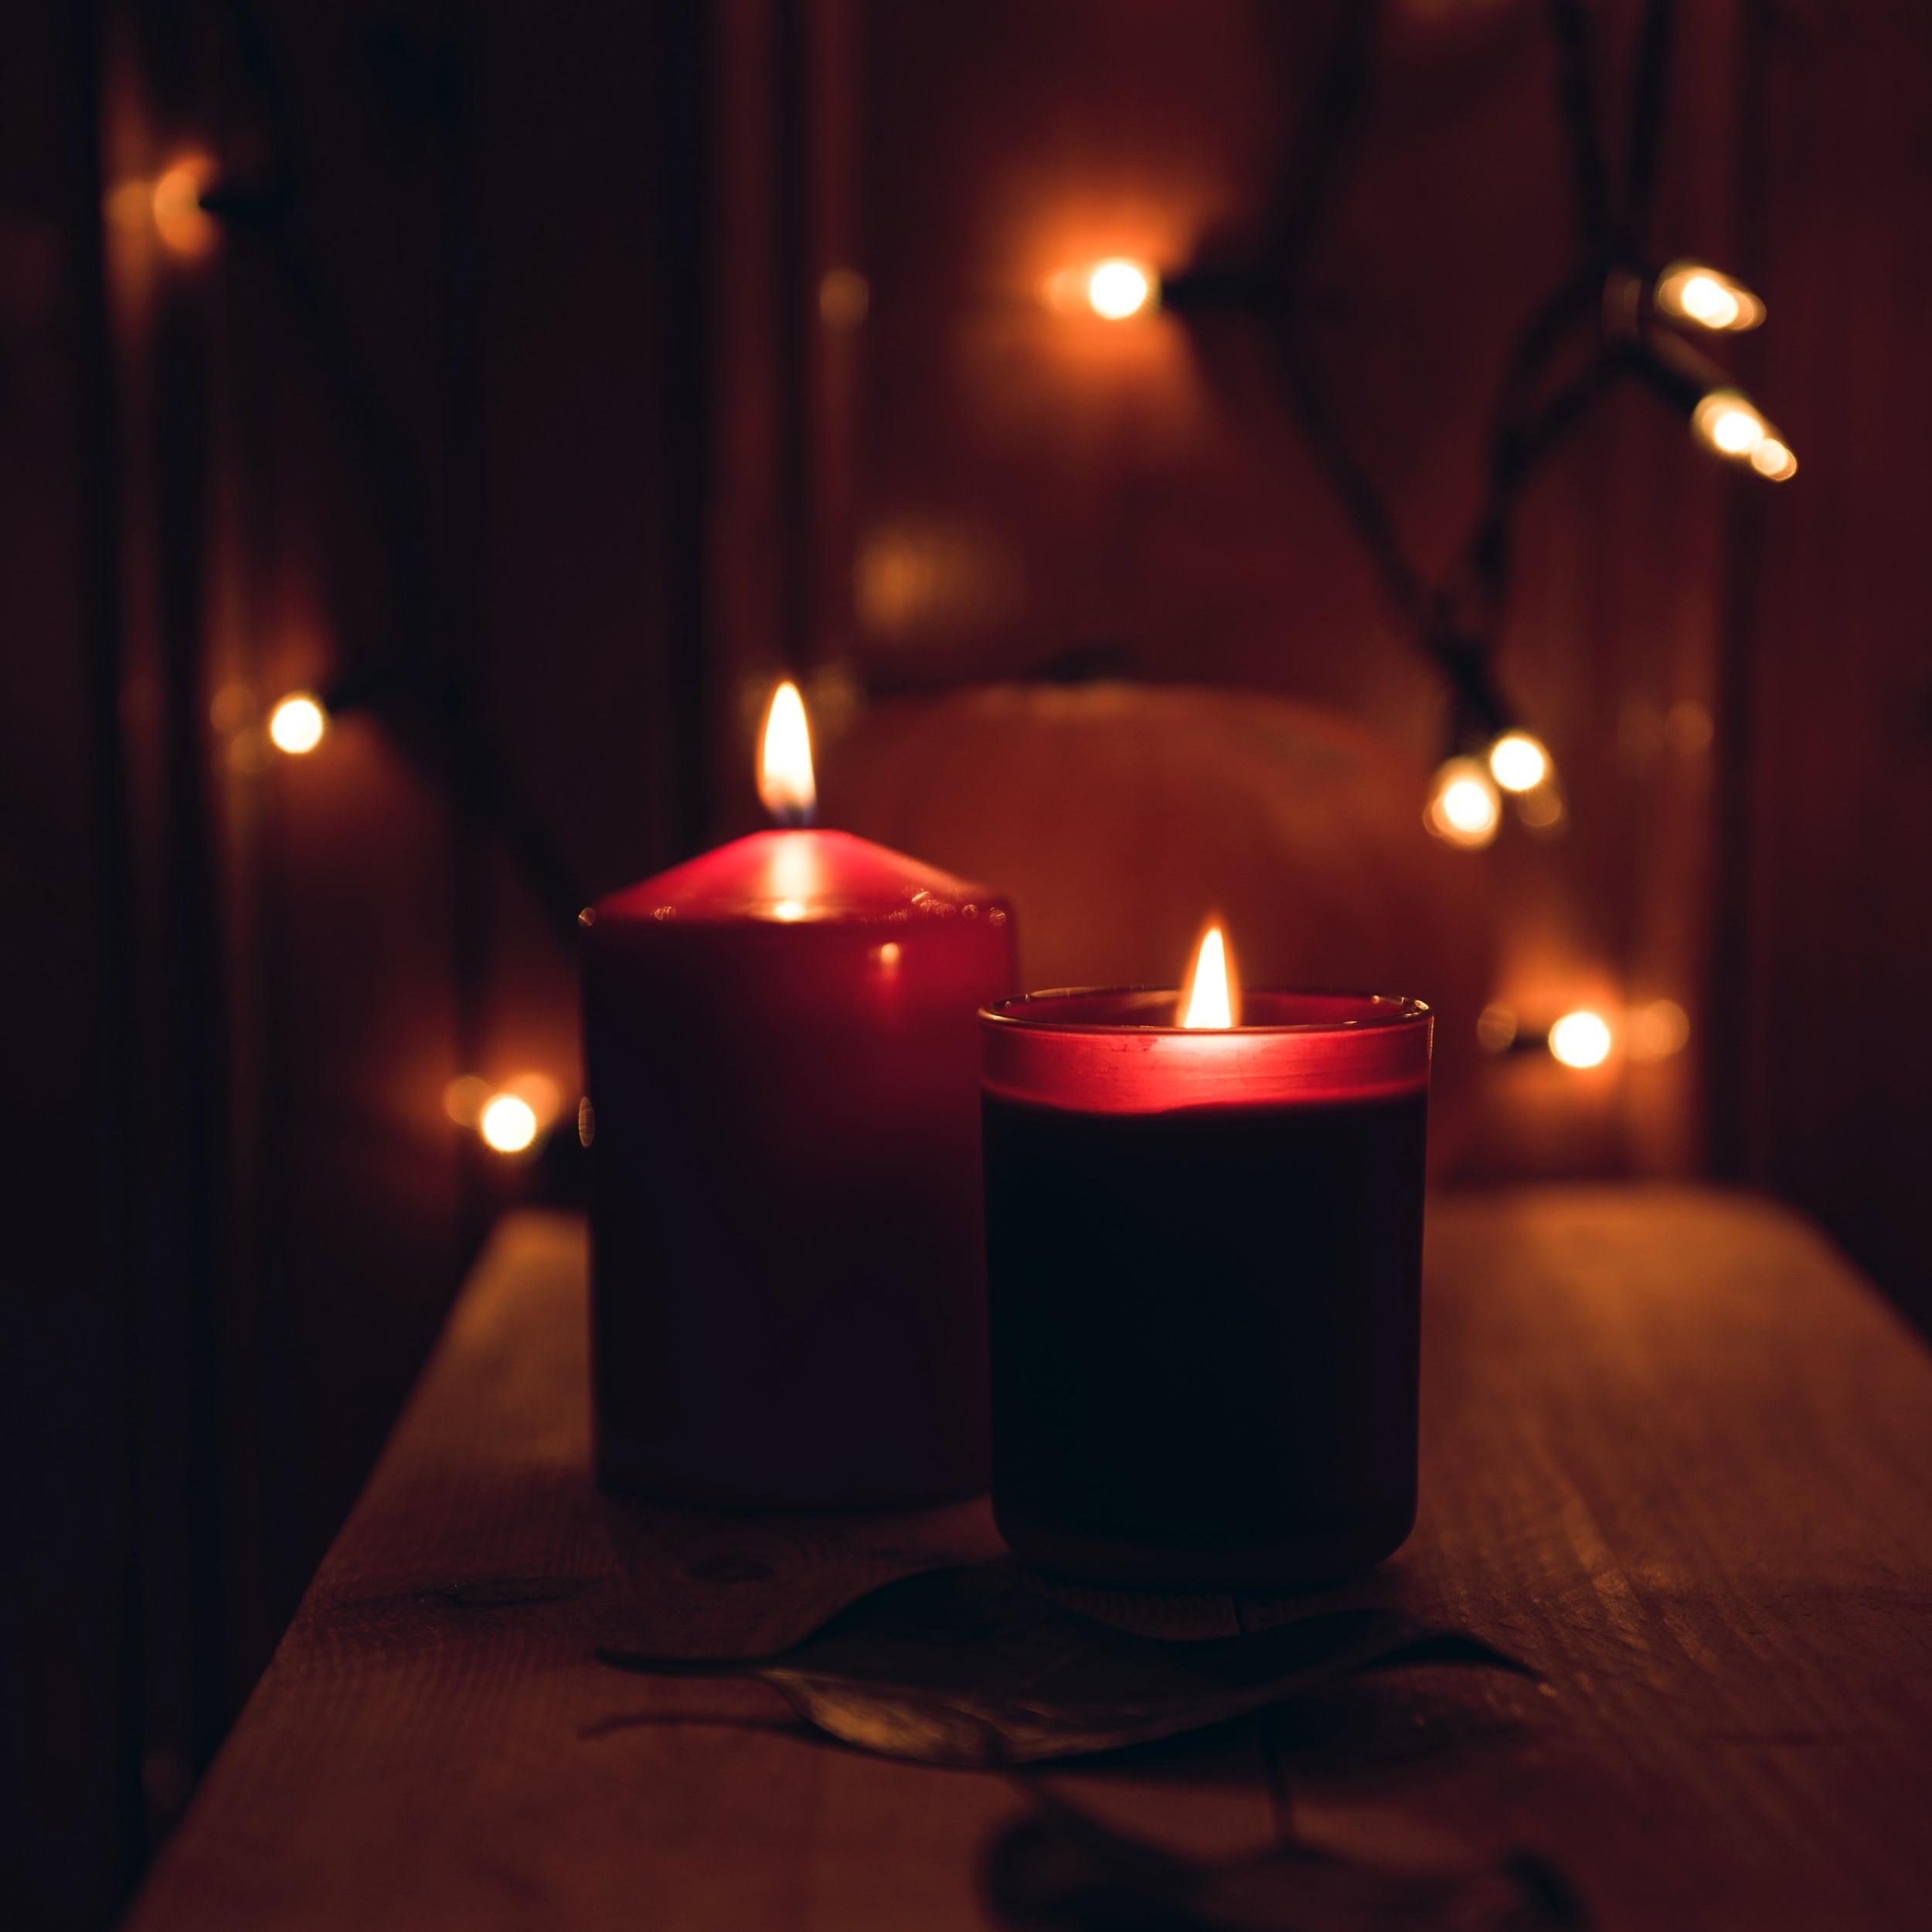 candle 3.jpg